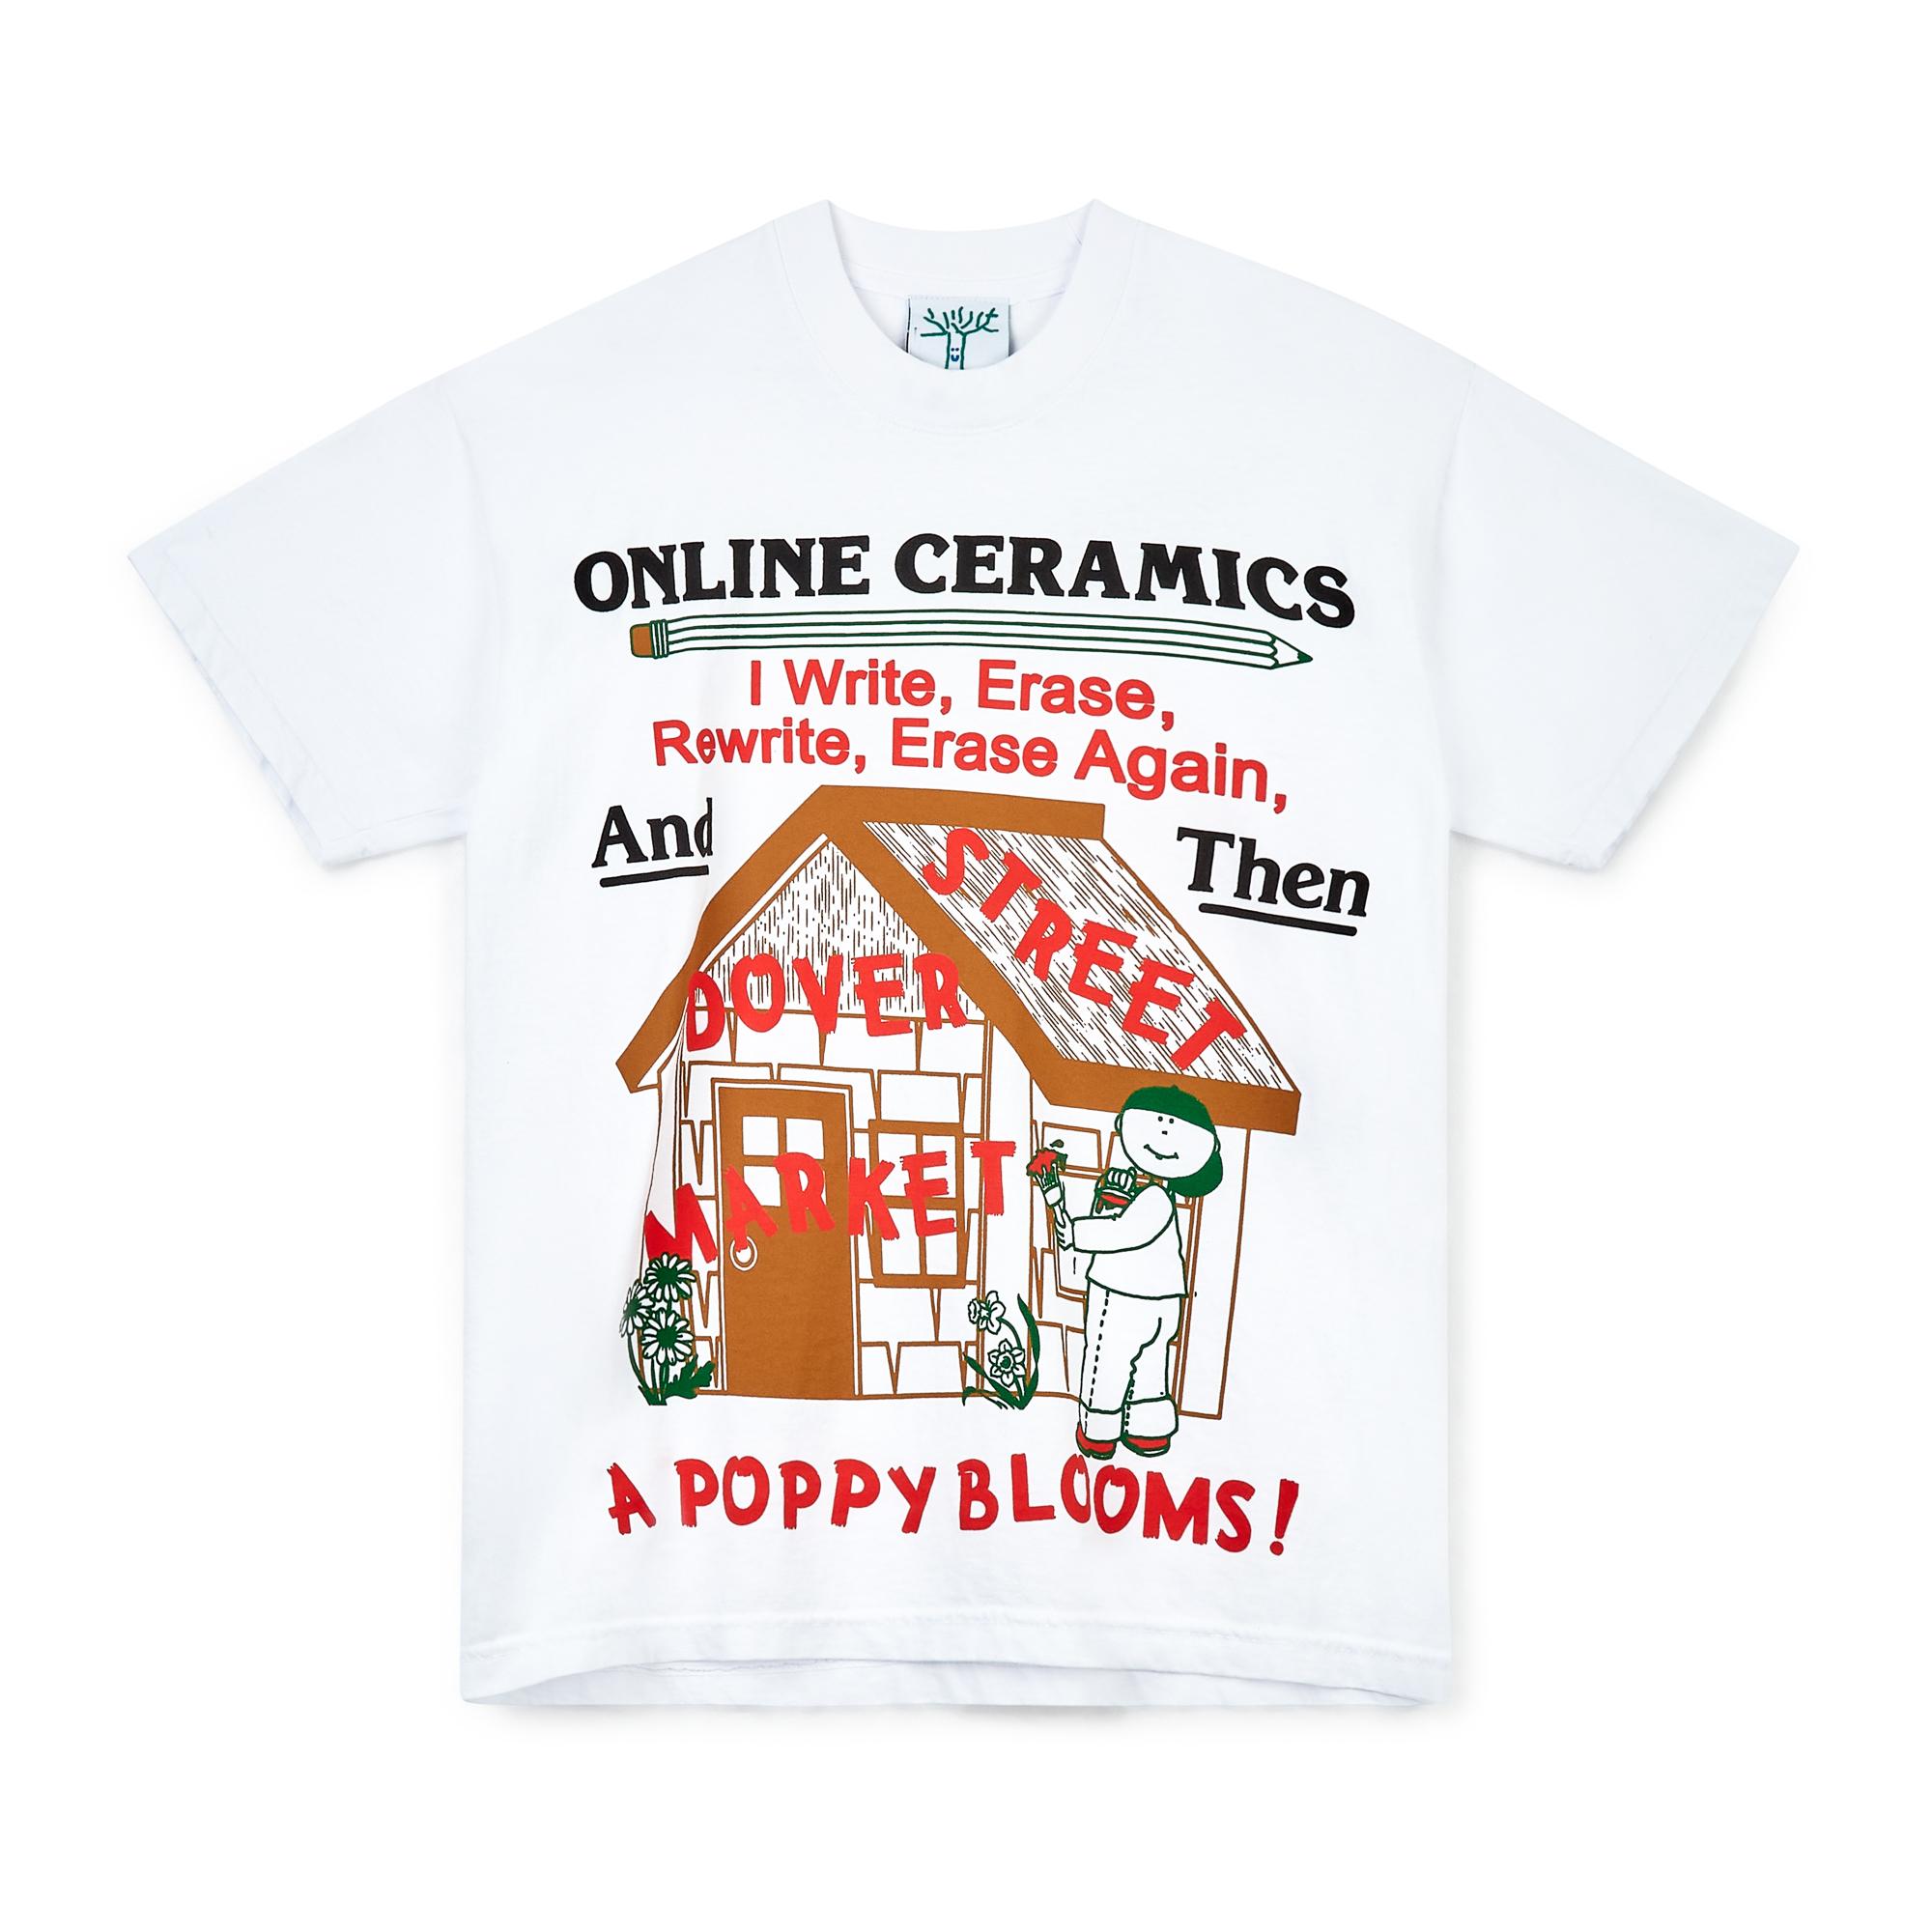 Online Ceramics - shot 20